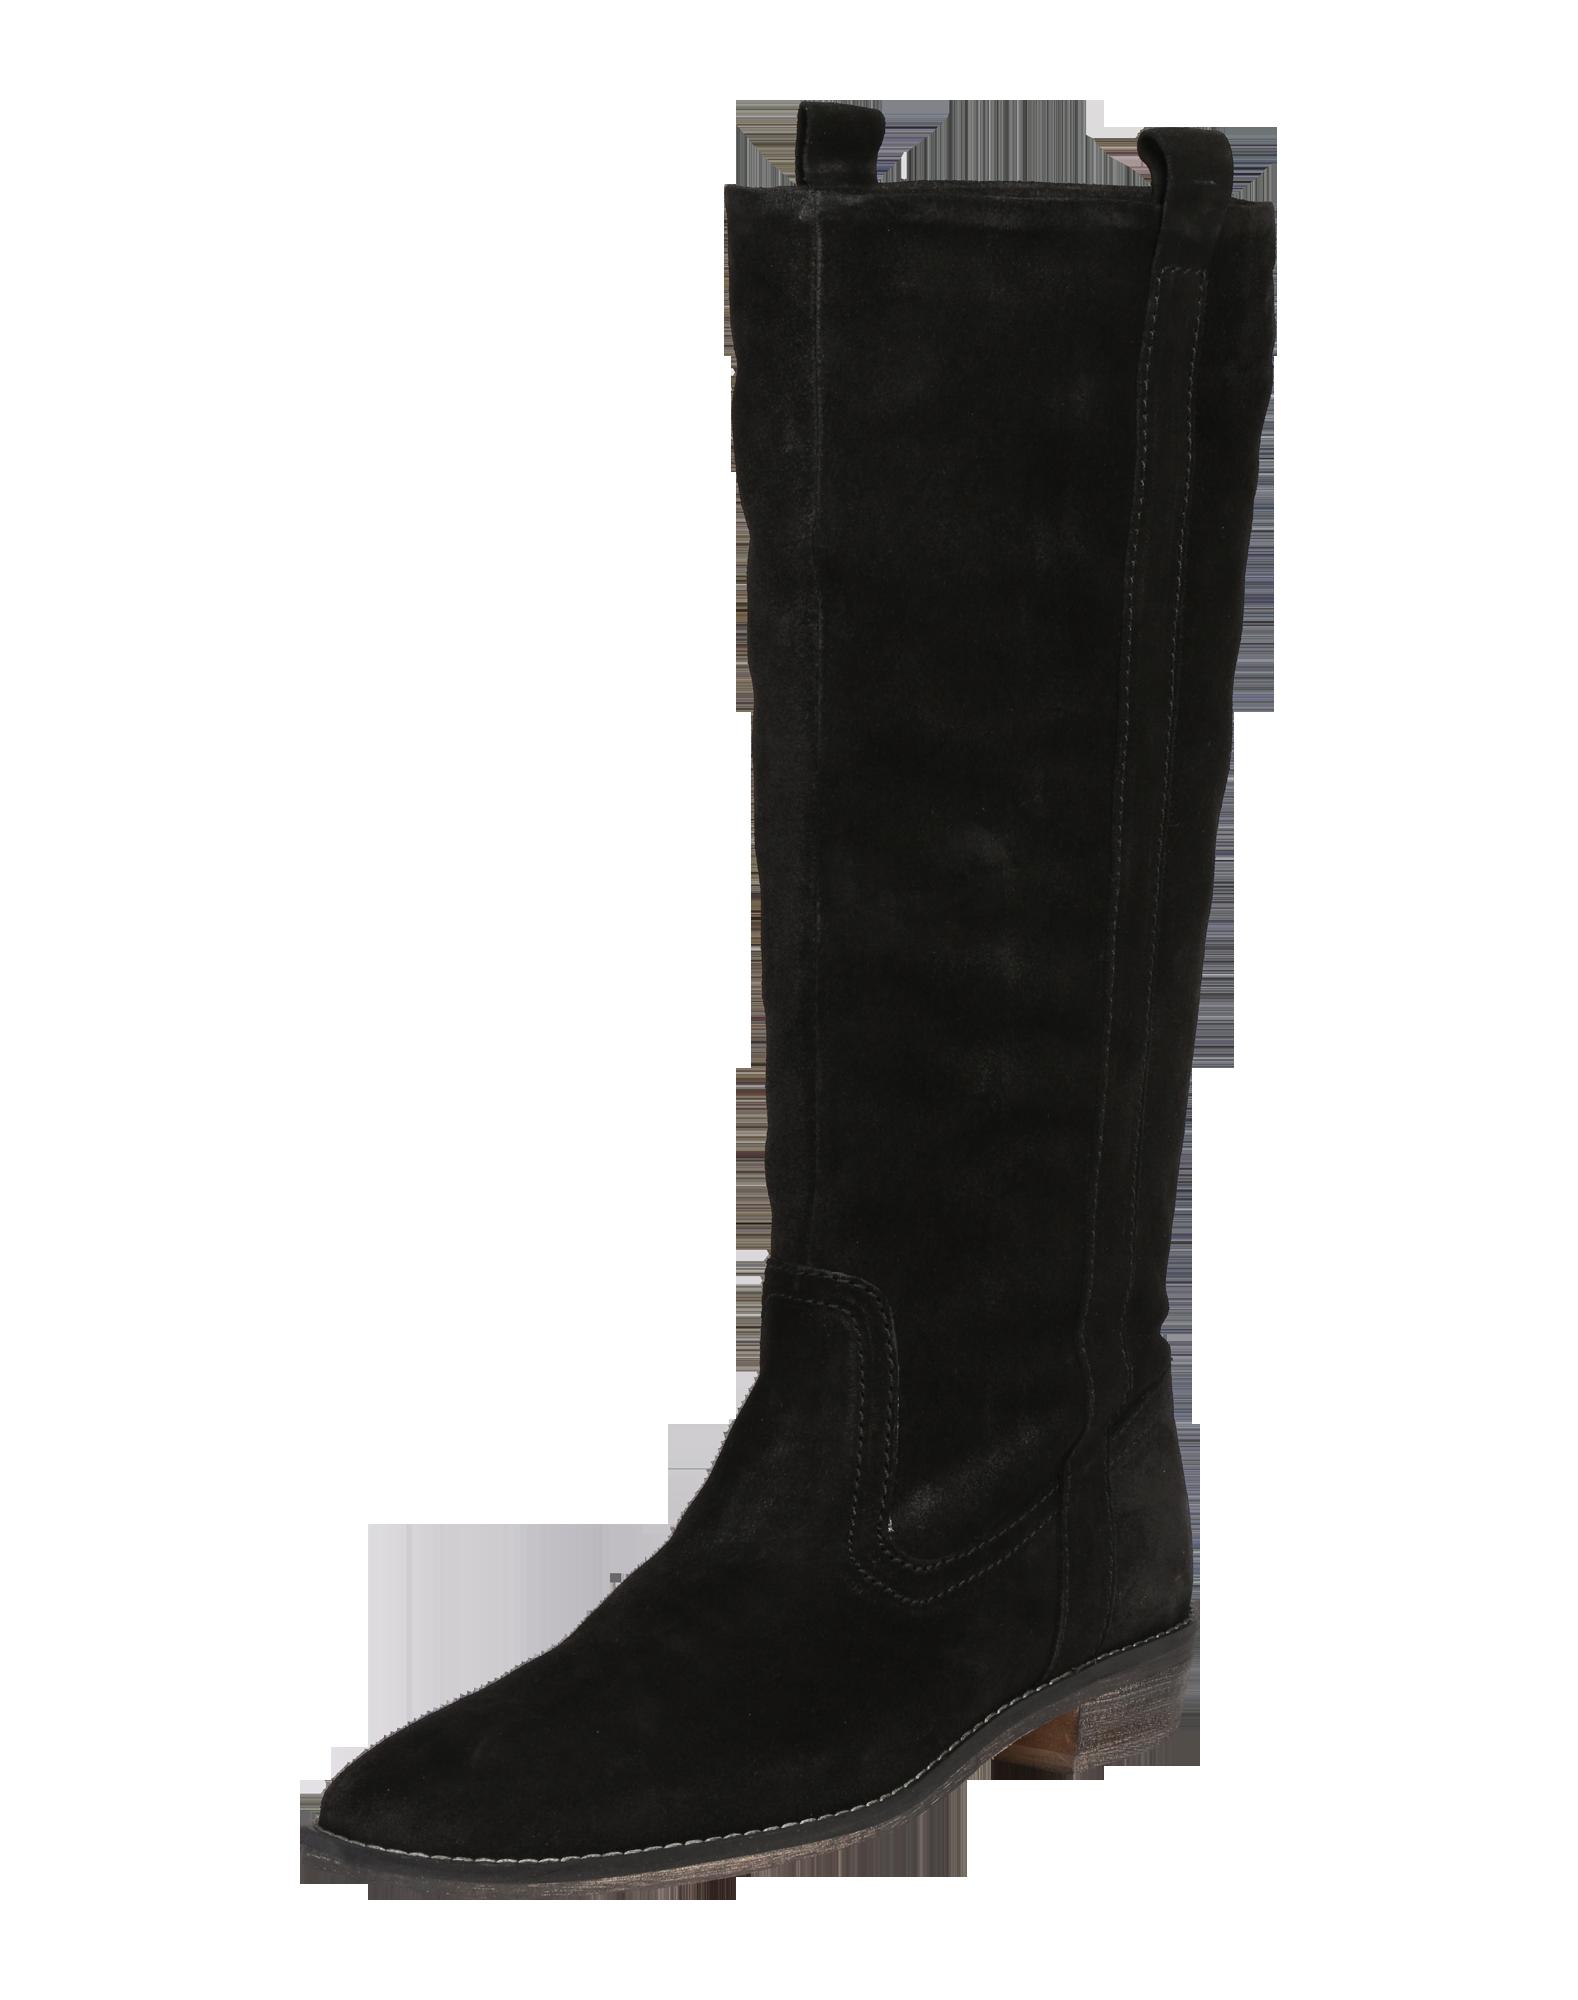 new concept afaa8 97dec AboutYou #ESPRIT #Klassische Stiefel #Sale #Schuhe #Stiefel ...